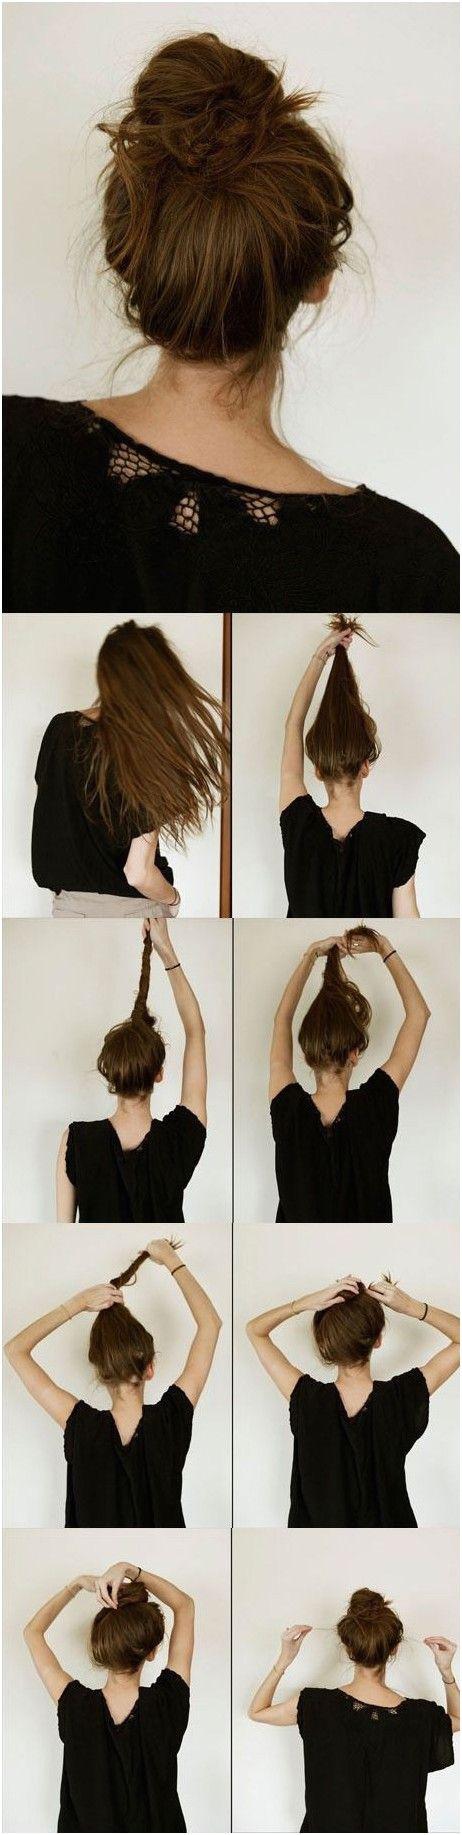 10 Ways to Make Cute Everyday Hairstyles Long Hair Tutorials PoPular Haircuts